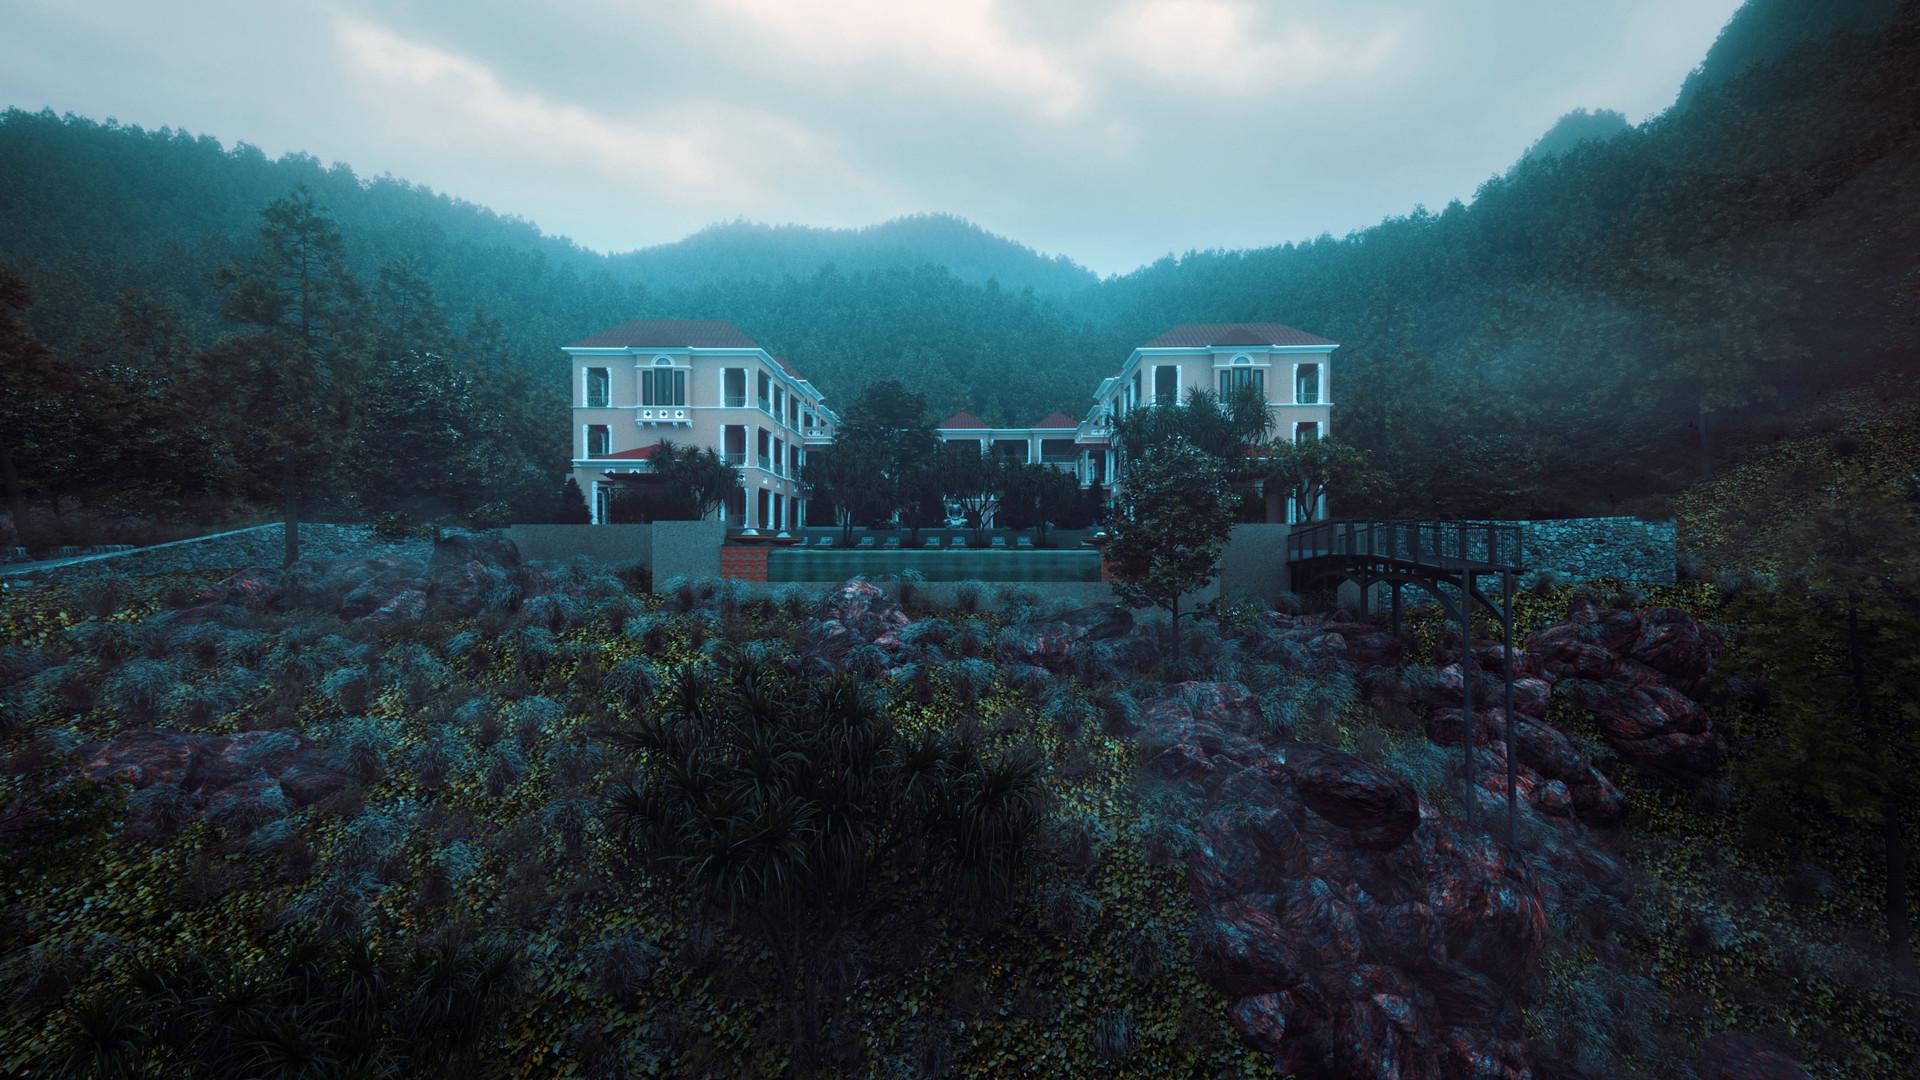 Adimest the hills